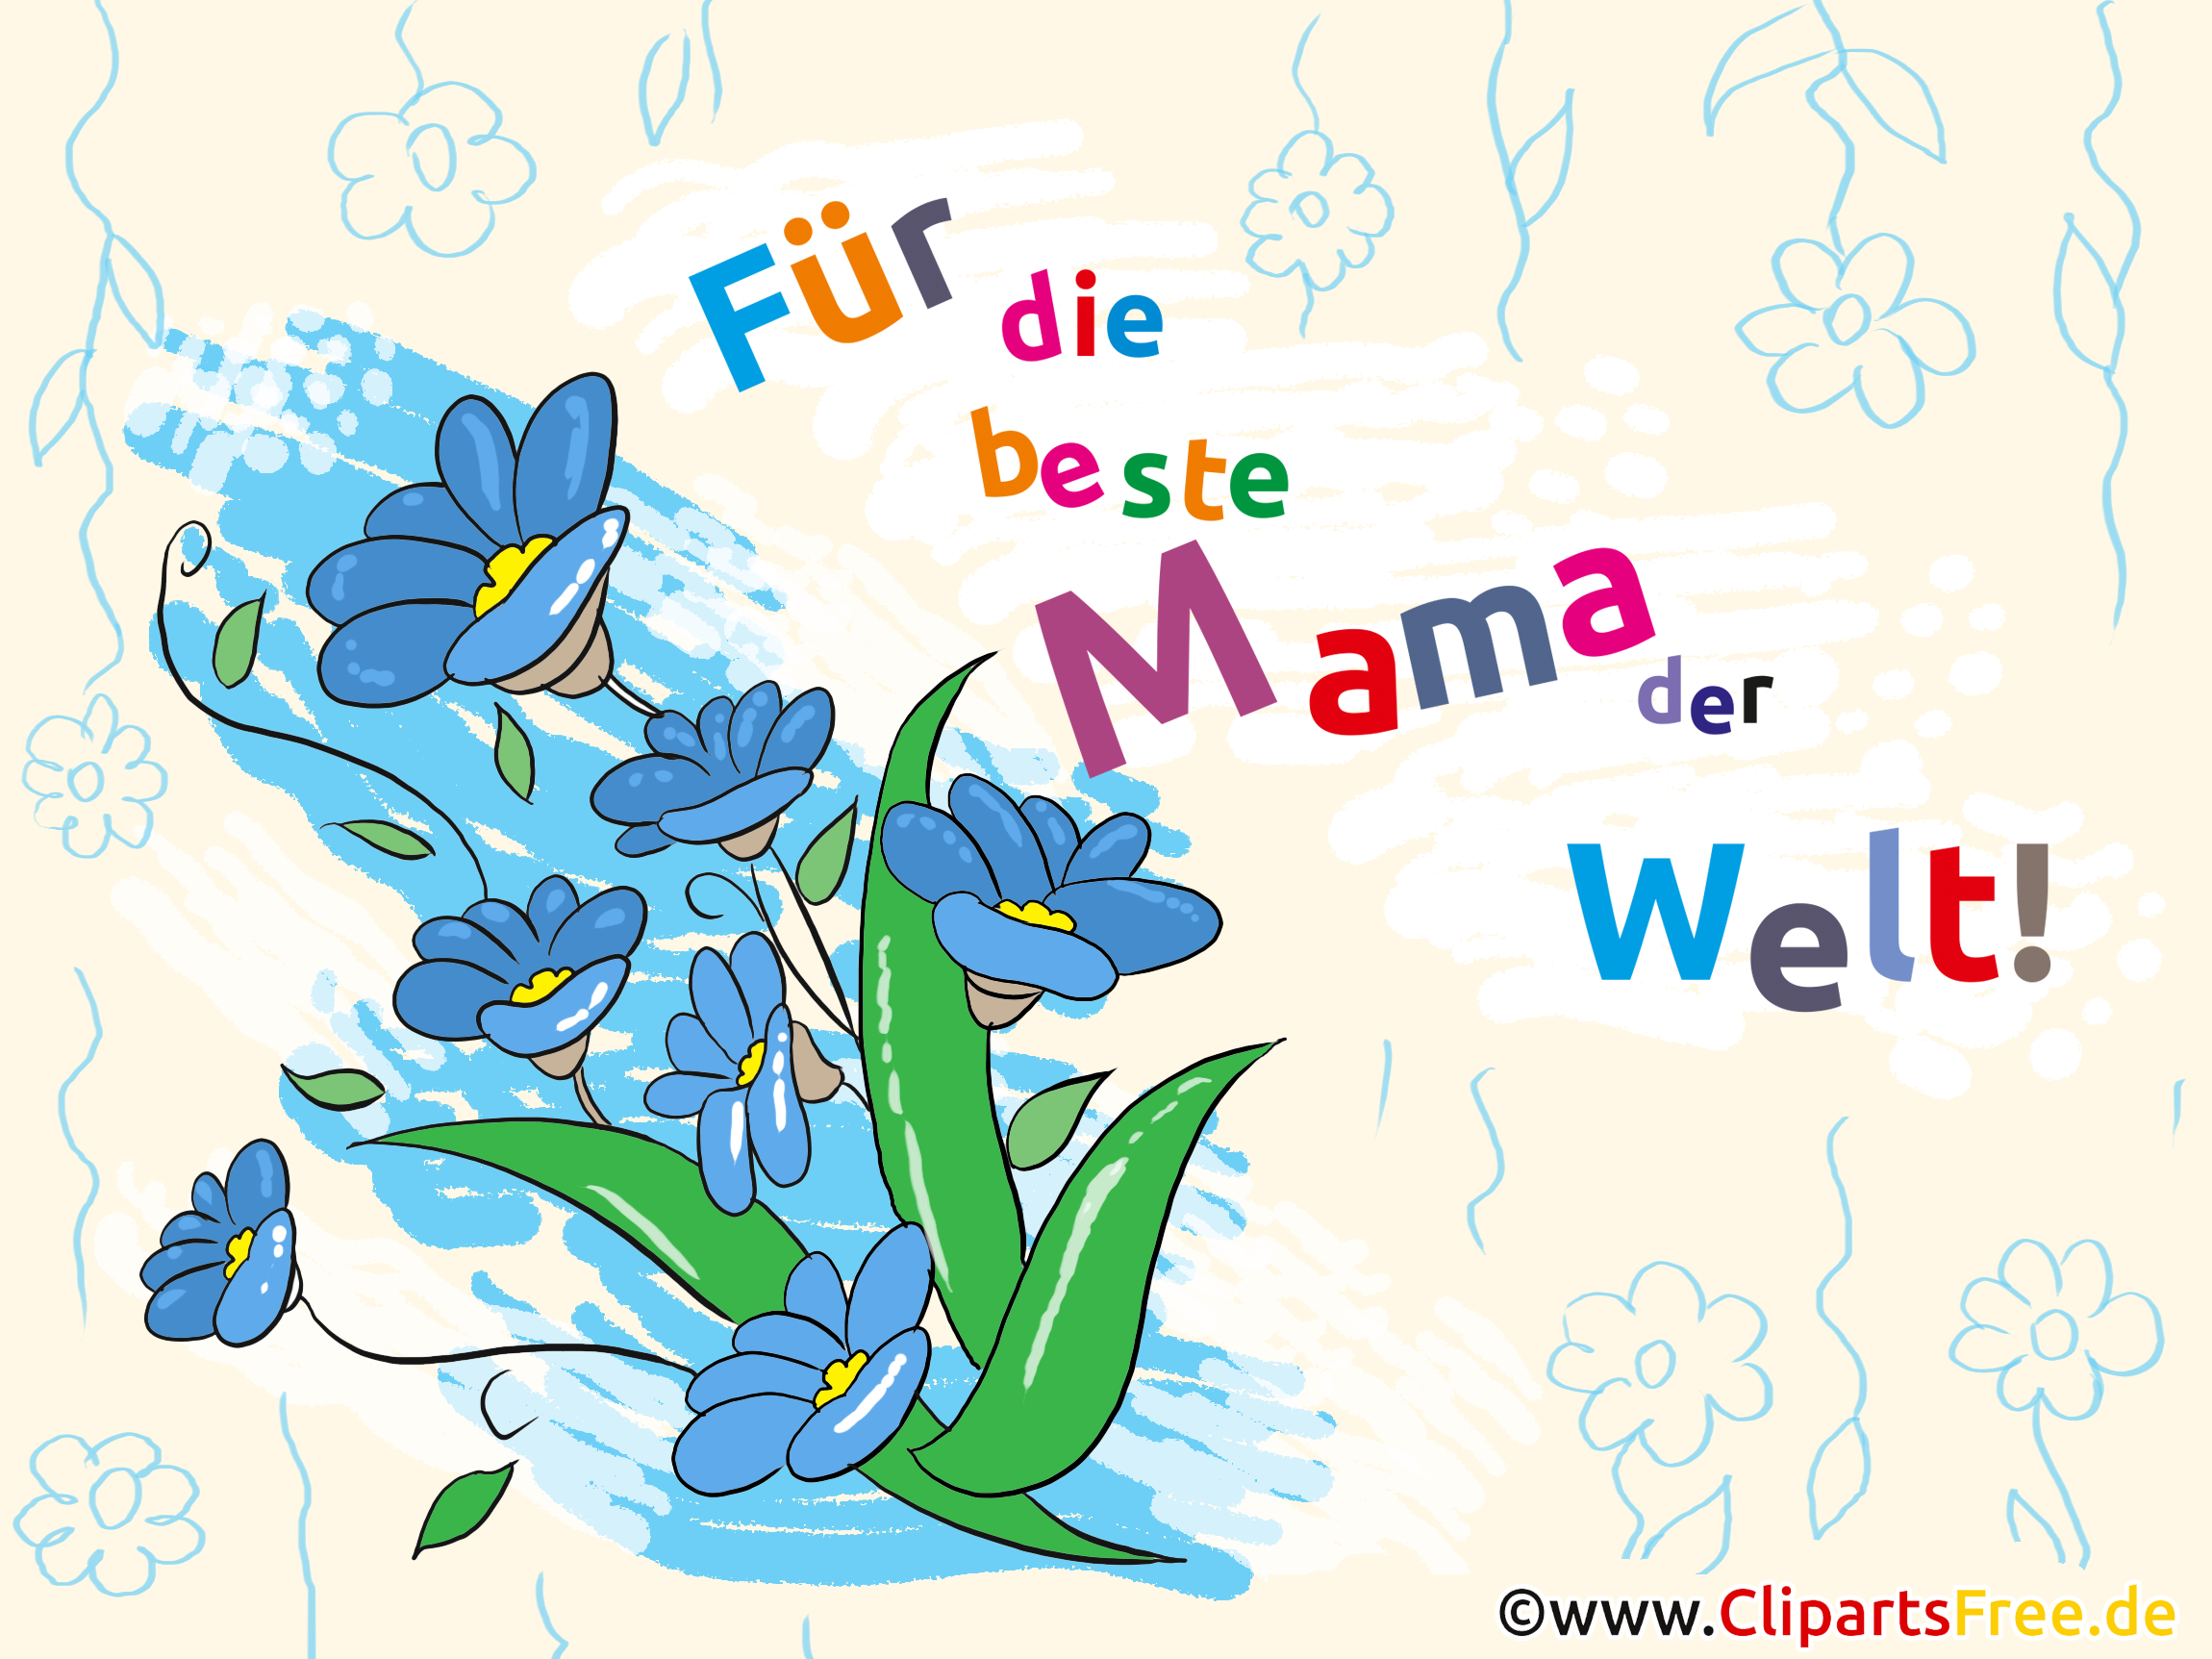 Muttertag Clipart, Bild, Illustration, Karte